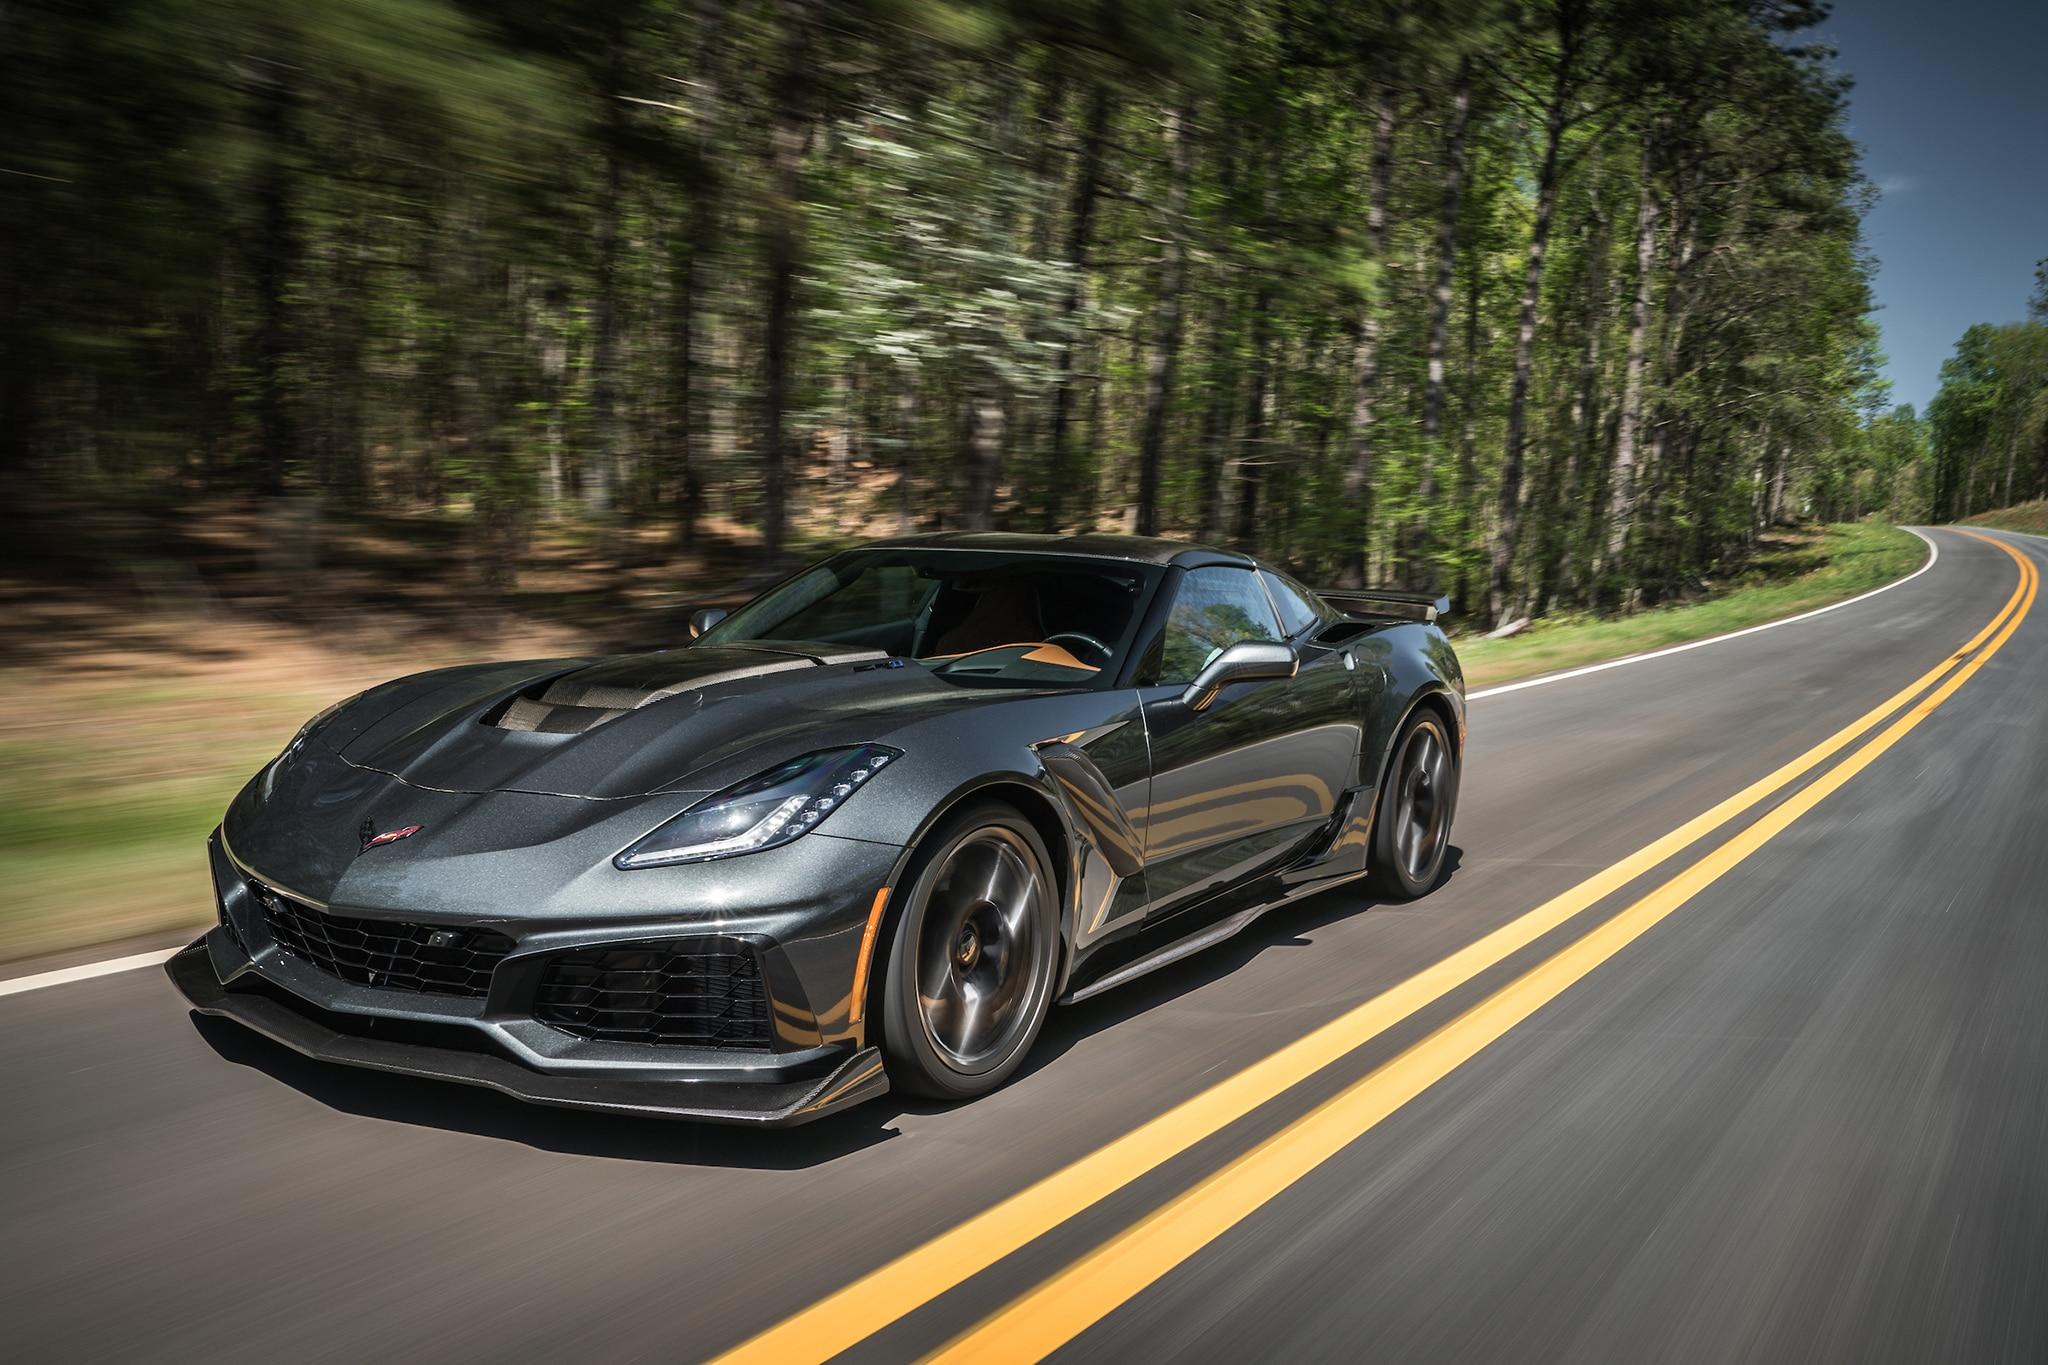 2019 Chevrolet Corvette Zr1 First Drive Automobile Magazine